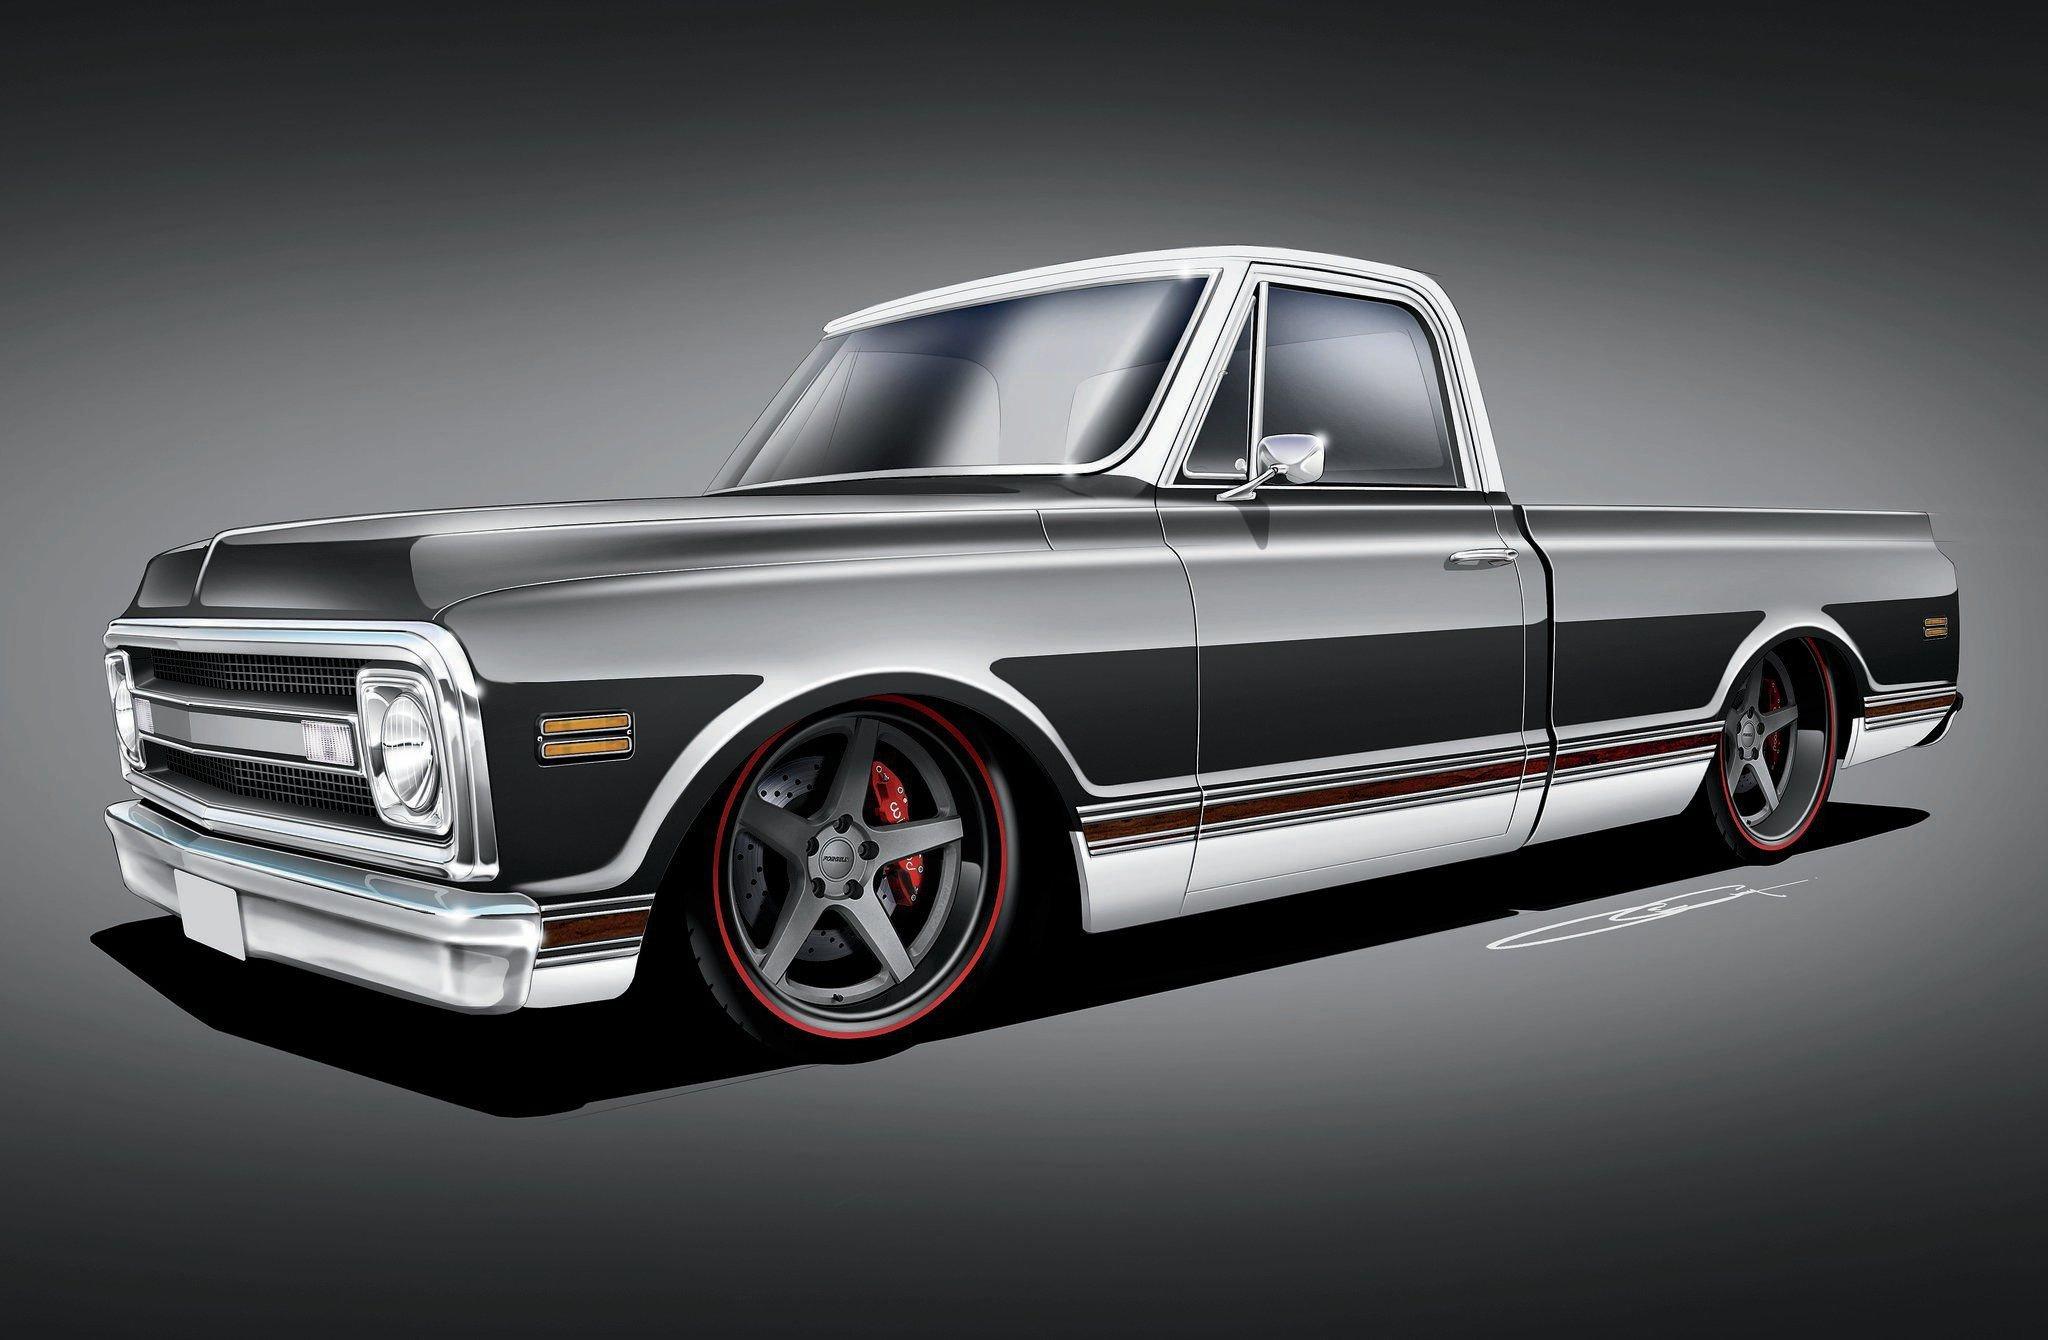 1969 Chevrolet C10 Rs Pickup 03 Wallpaper 0x0 613862